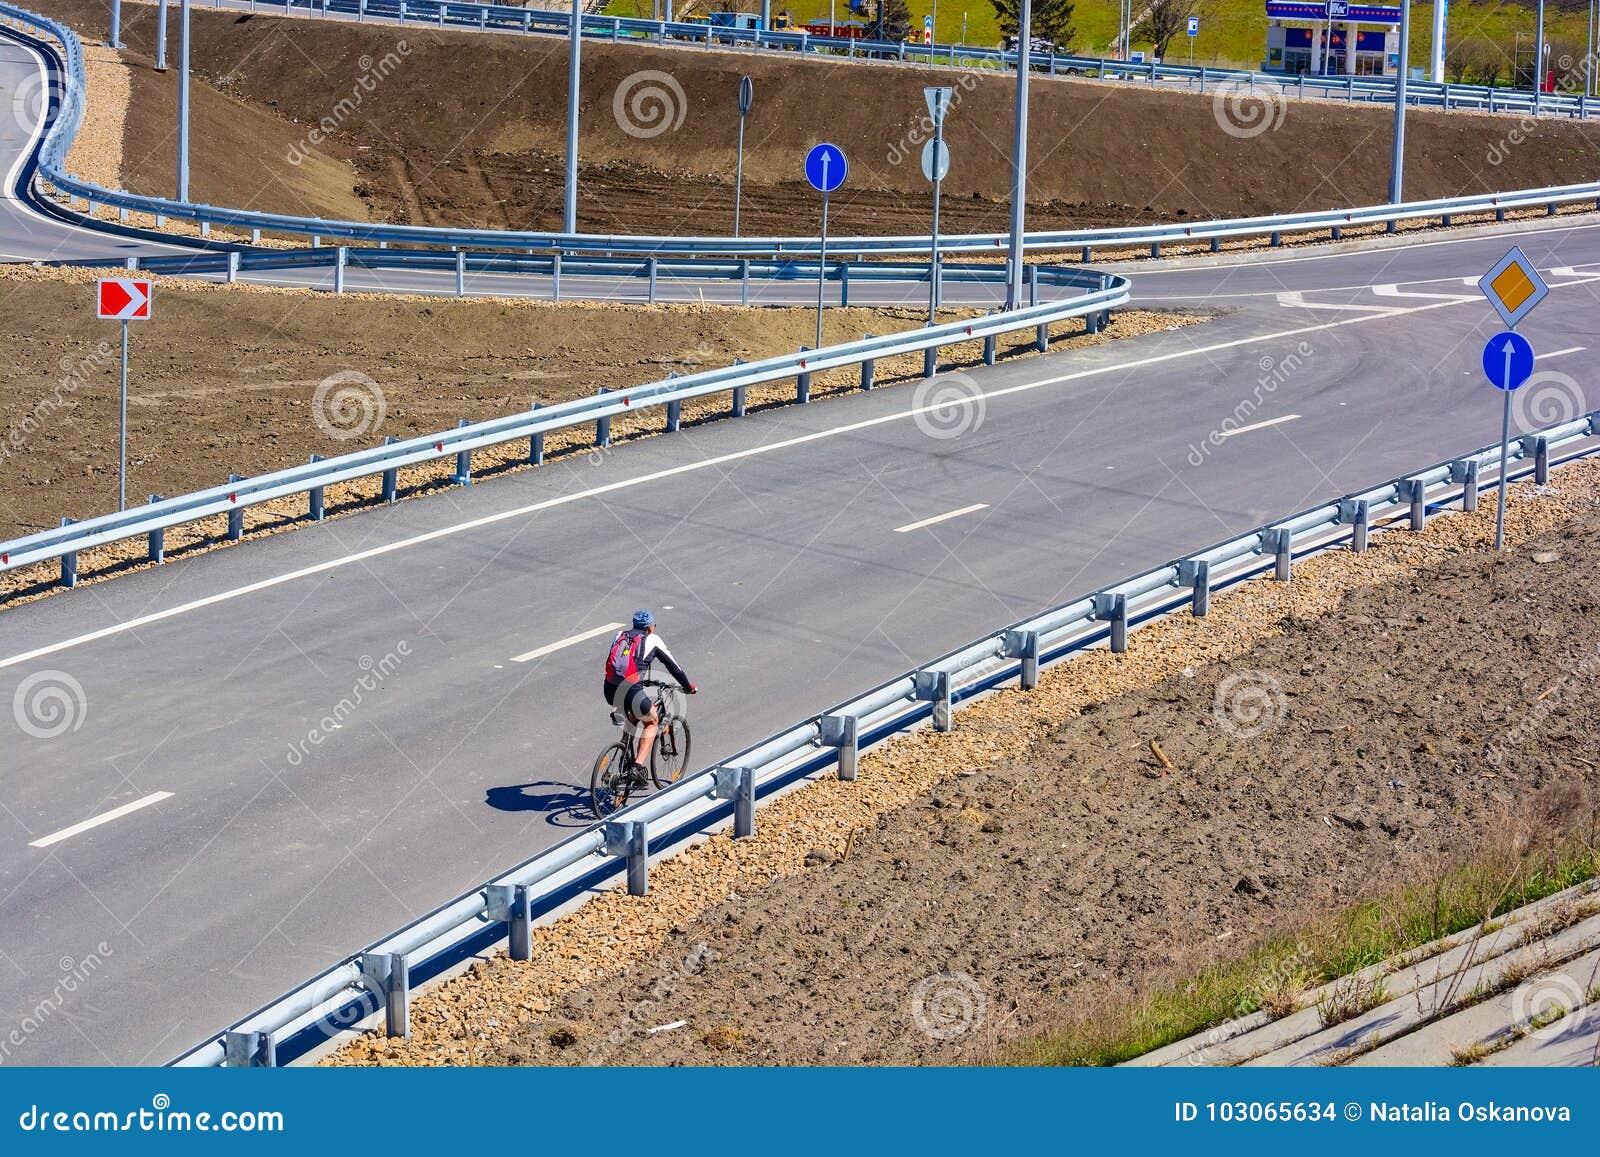 Fietser op stadsweg zonder verkeer